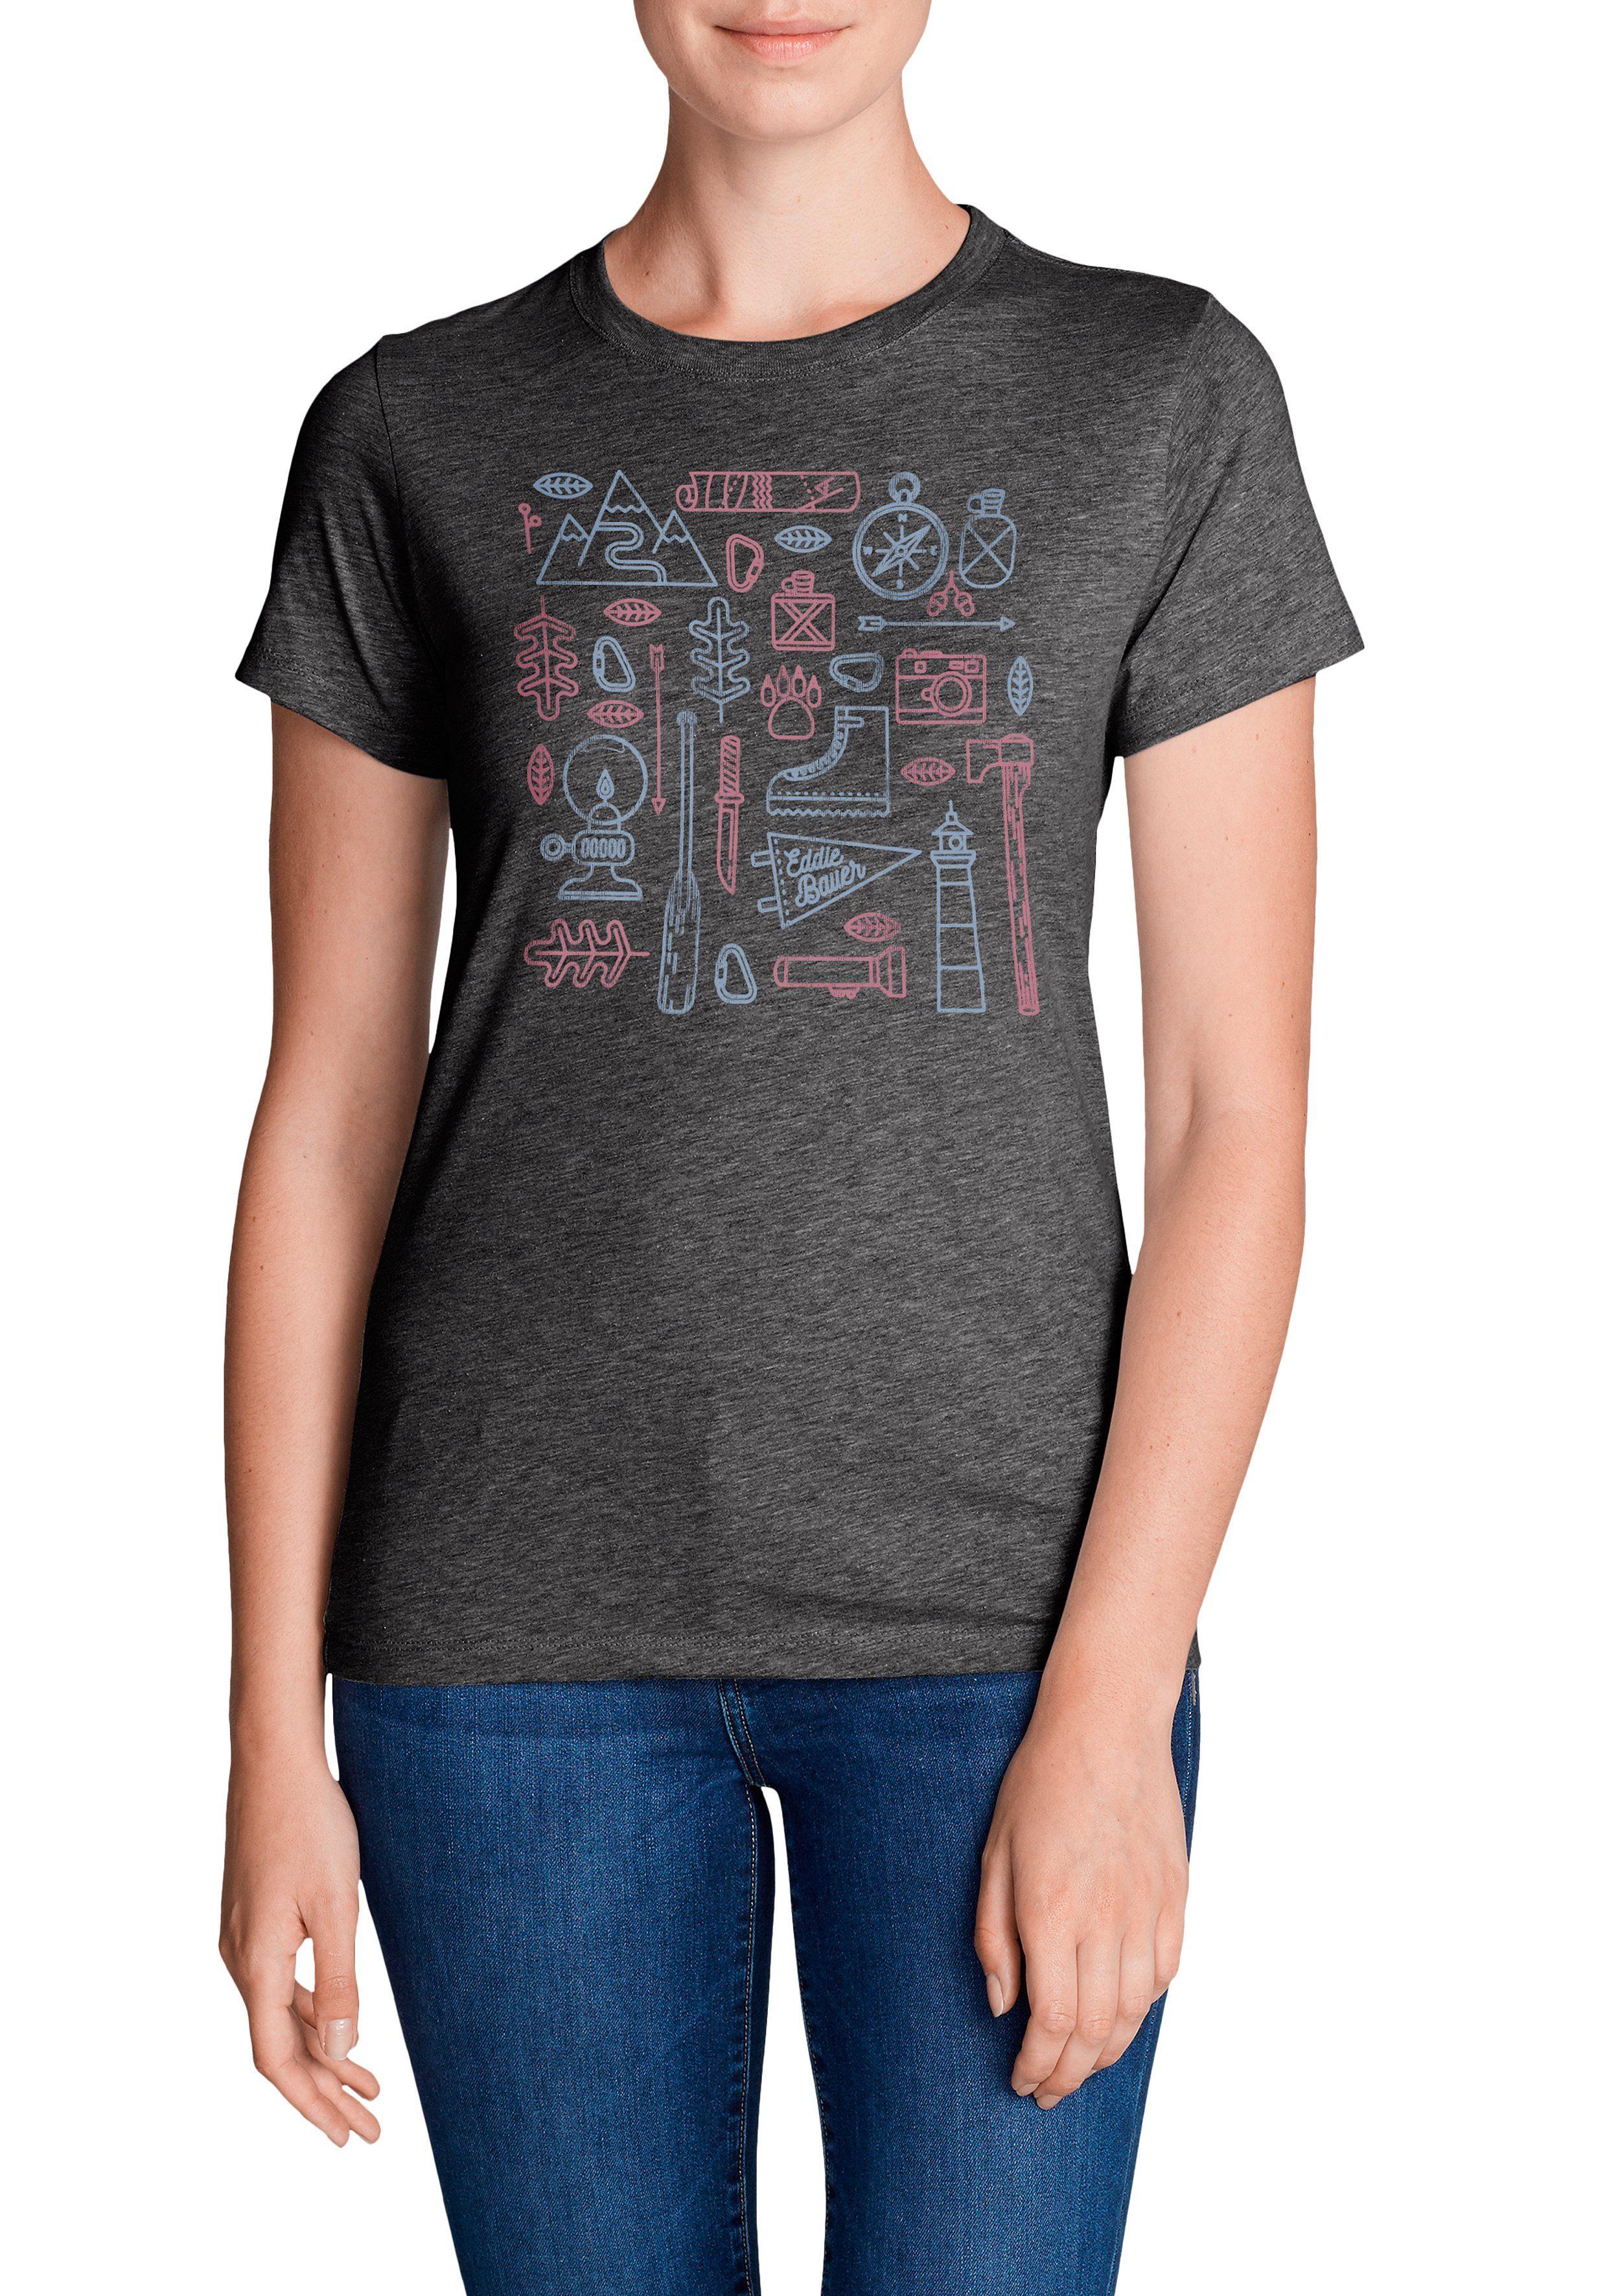 Eddie Bauer T-Shirt T-Shirt - Camping Emoji